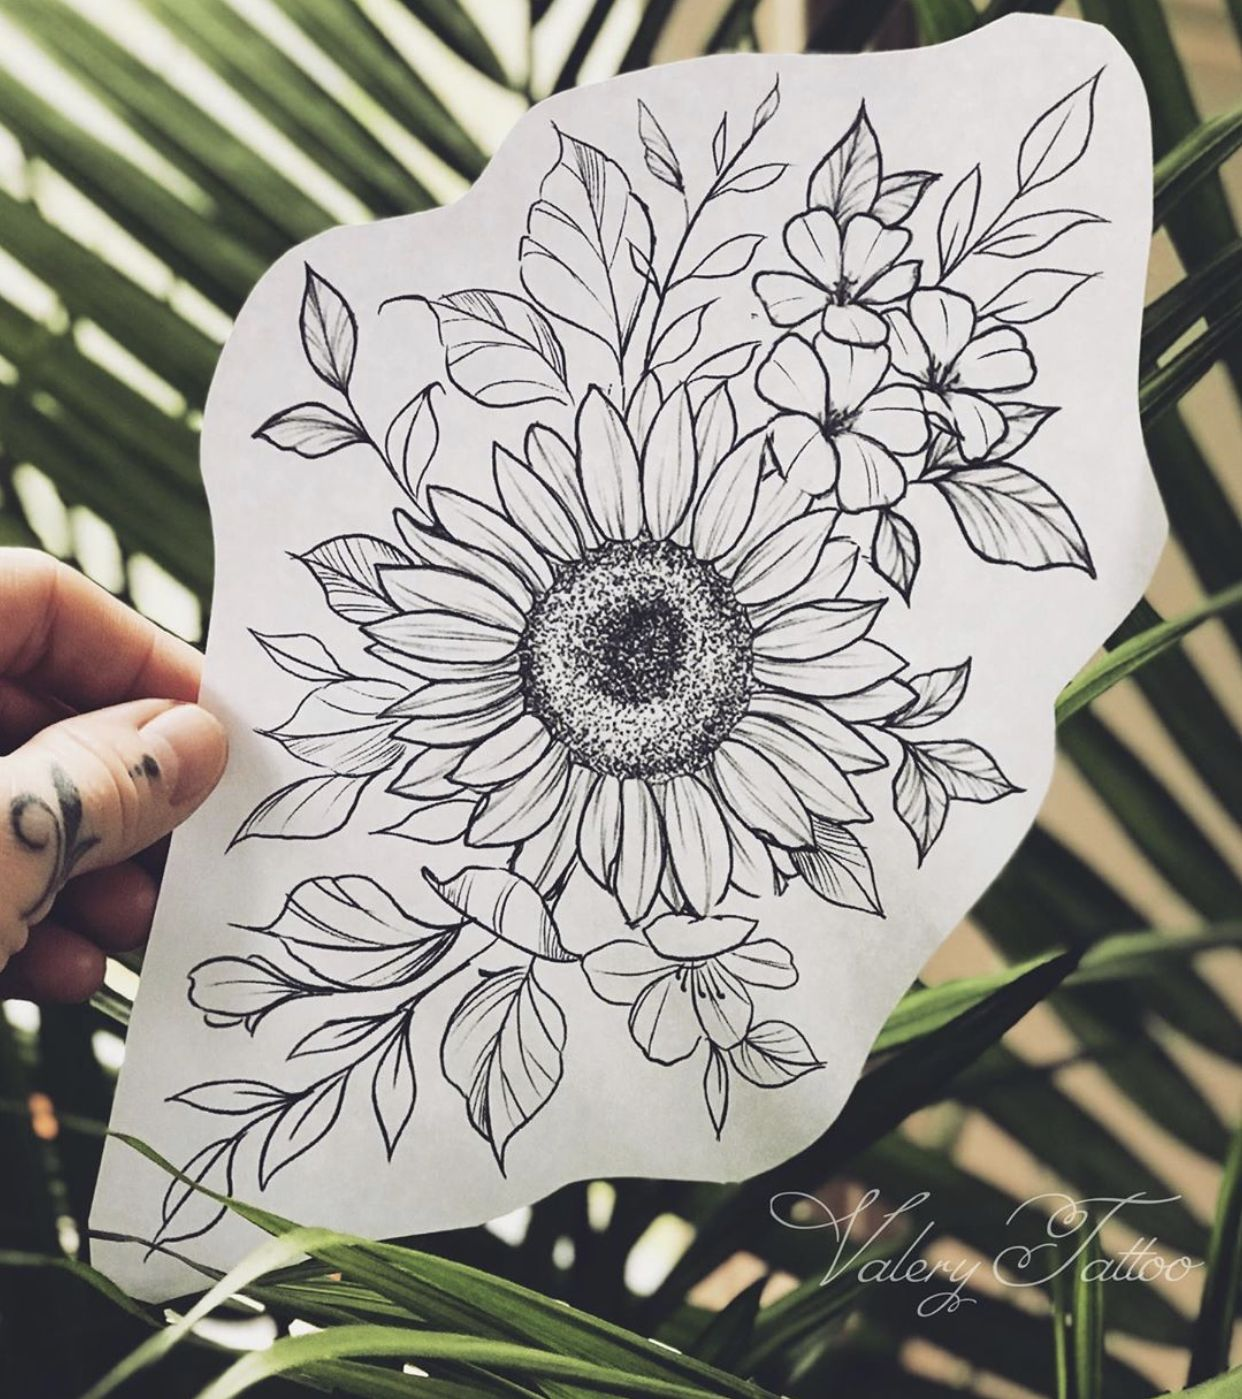 Photo of @primaryflowers on instagram